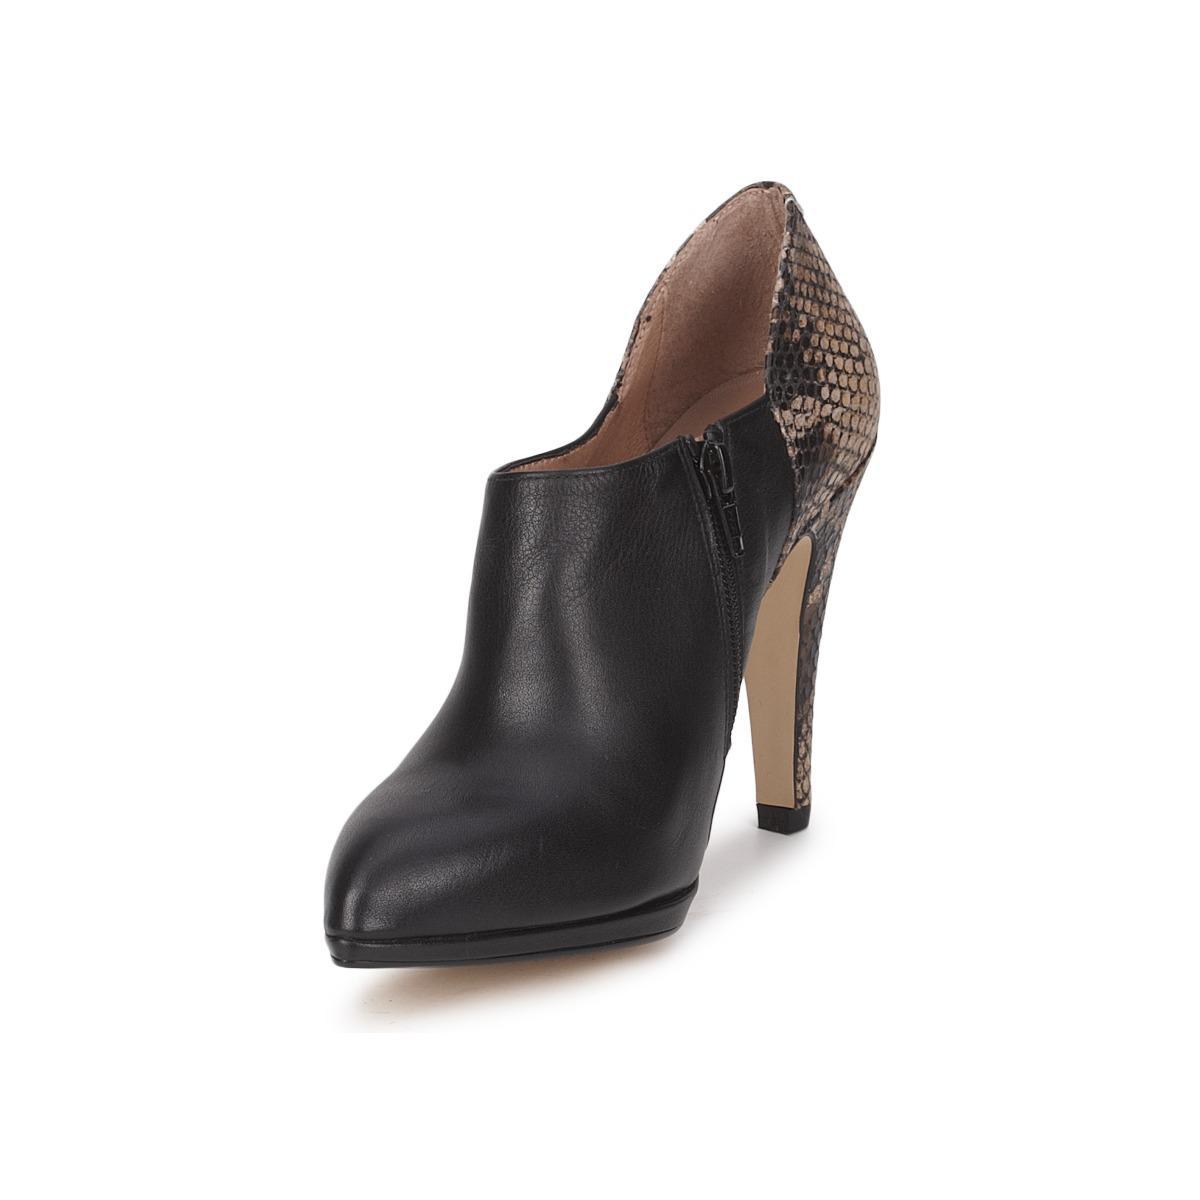 KMB - Women's Low Boots In Black